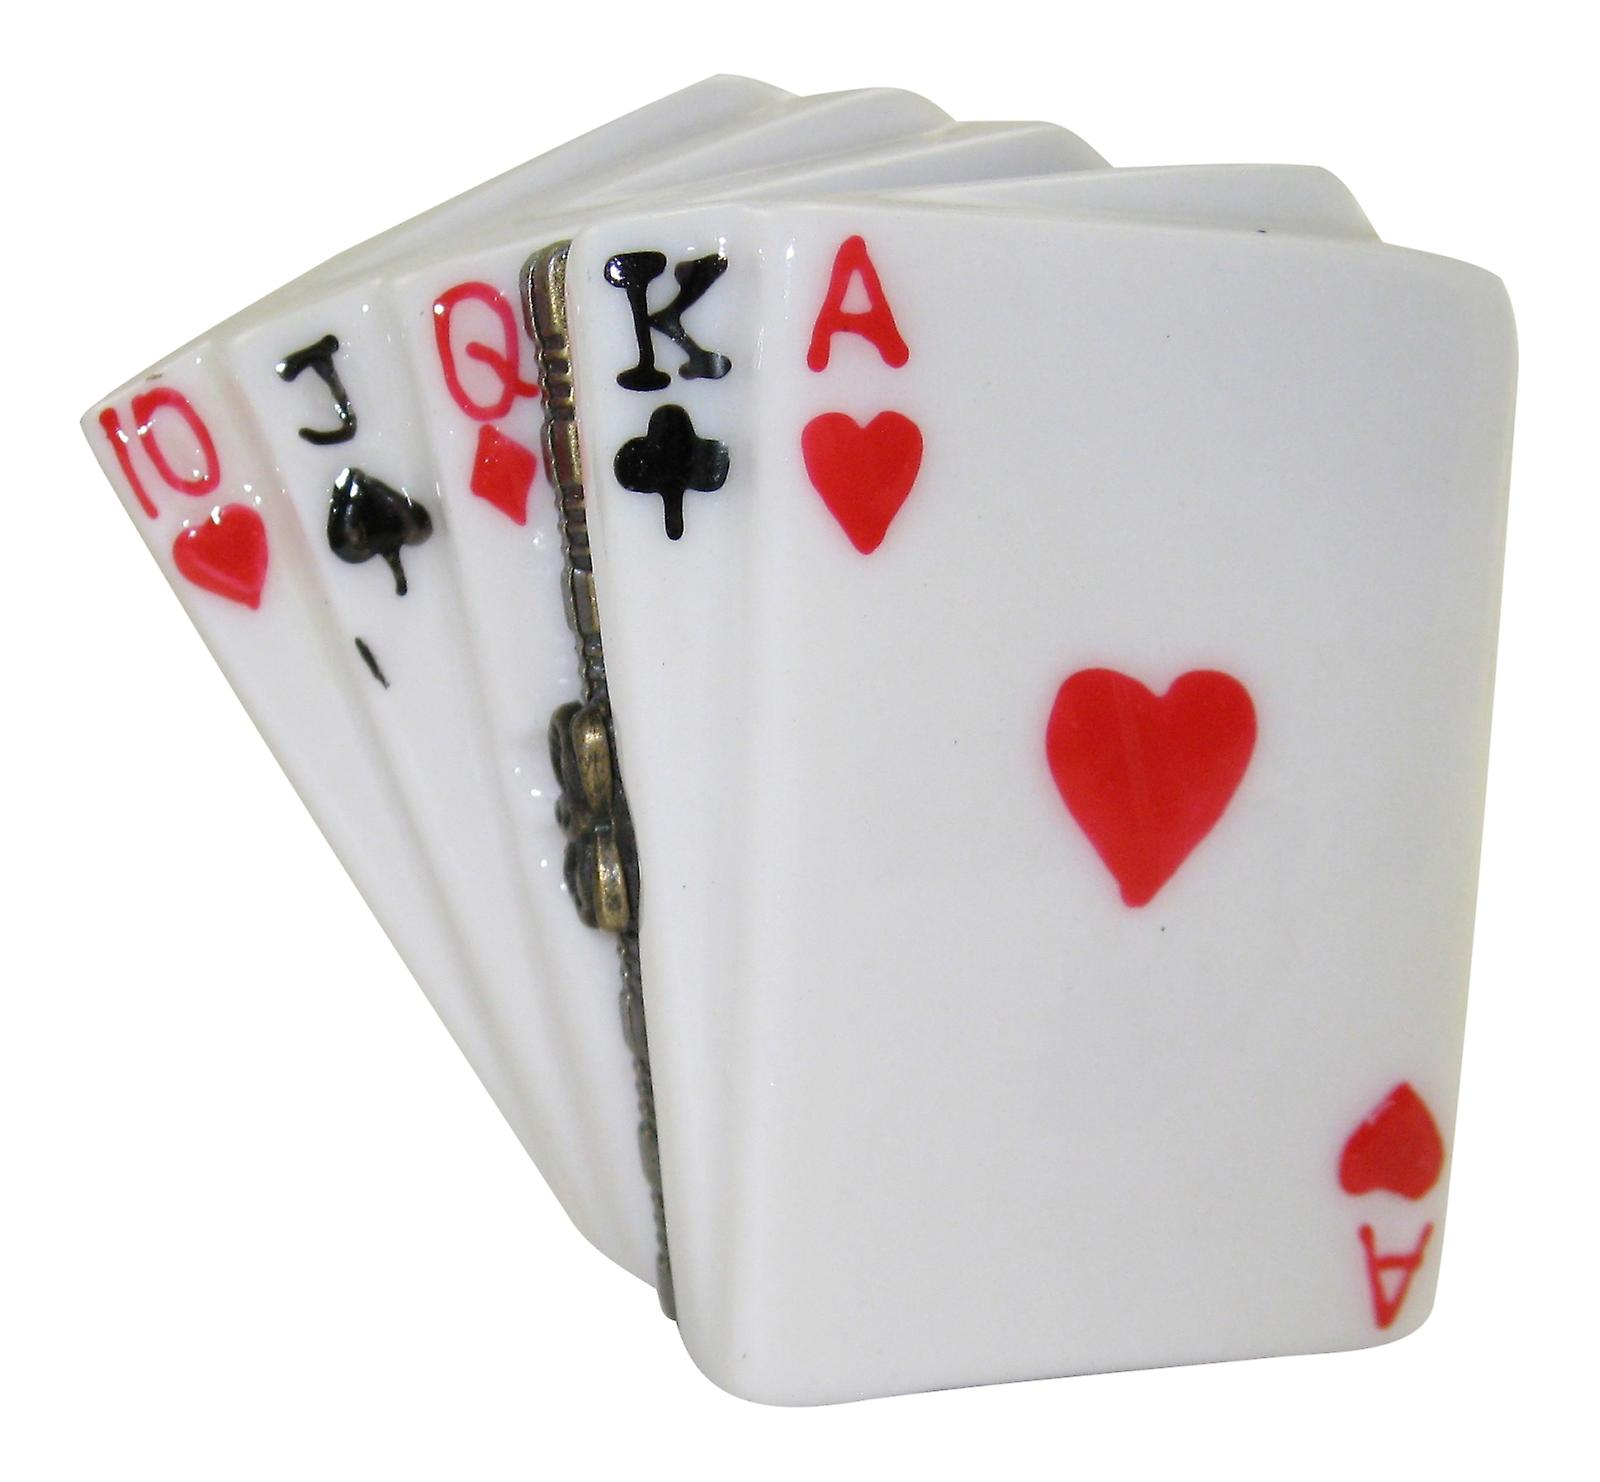 Poker Hand Straight Winner Playing Cards Porcelain Hinged Trinket Box